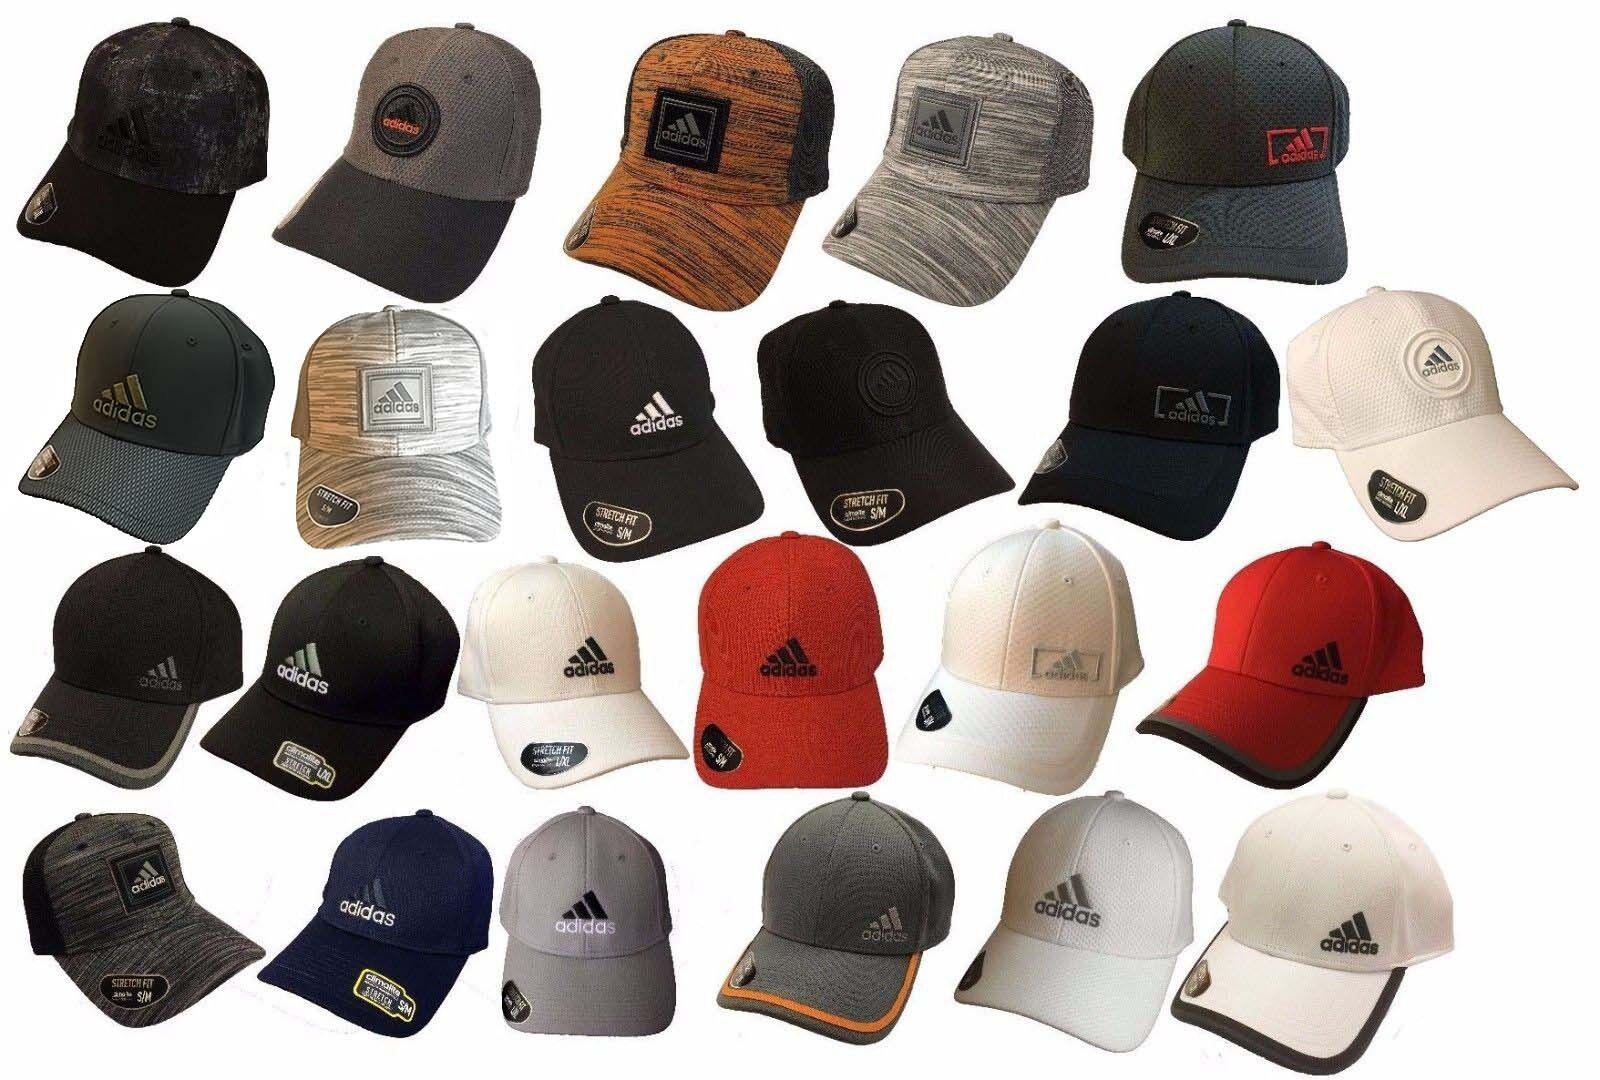 Adidas Climalite Flex Fit Stretchable Baseball Hat Cap-Moist